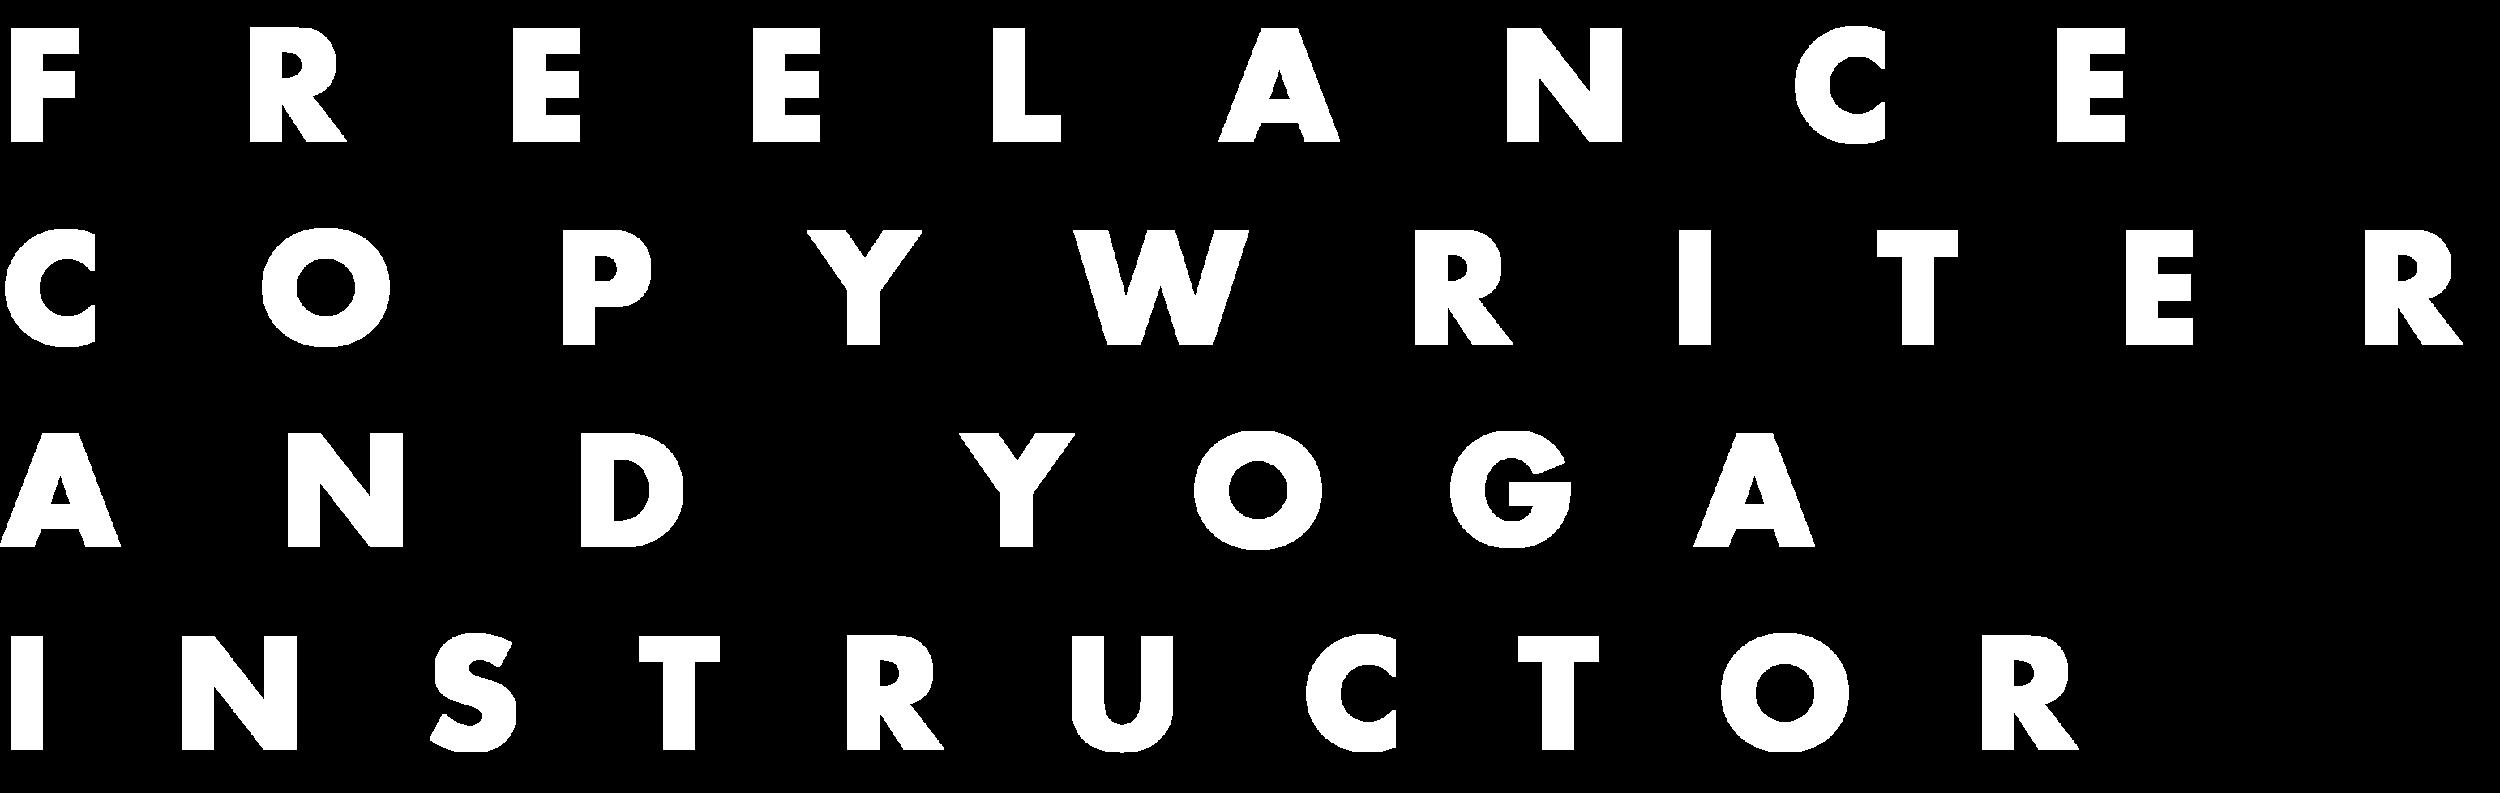 Dinah von Schoenberg Creative Copywriter and Yoga Instructor